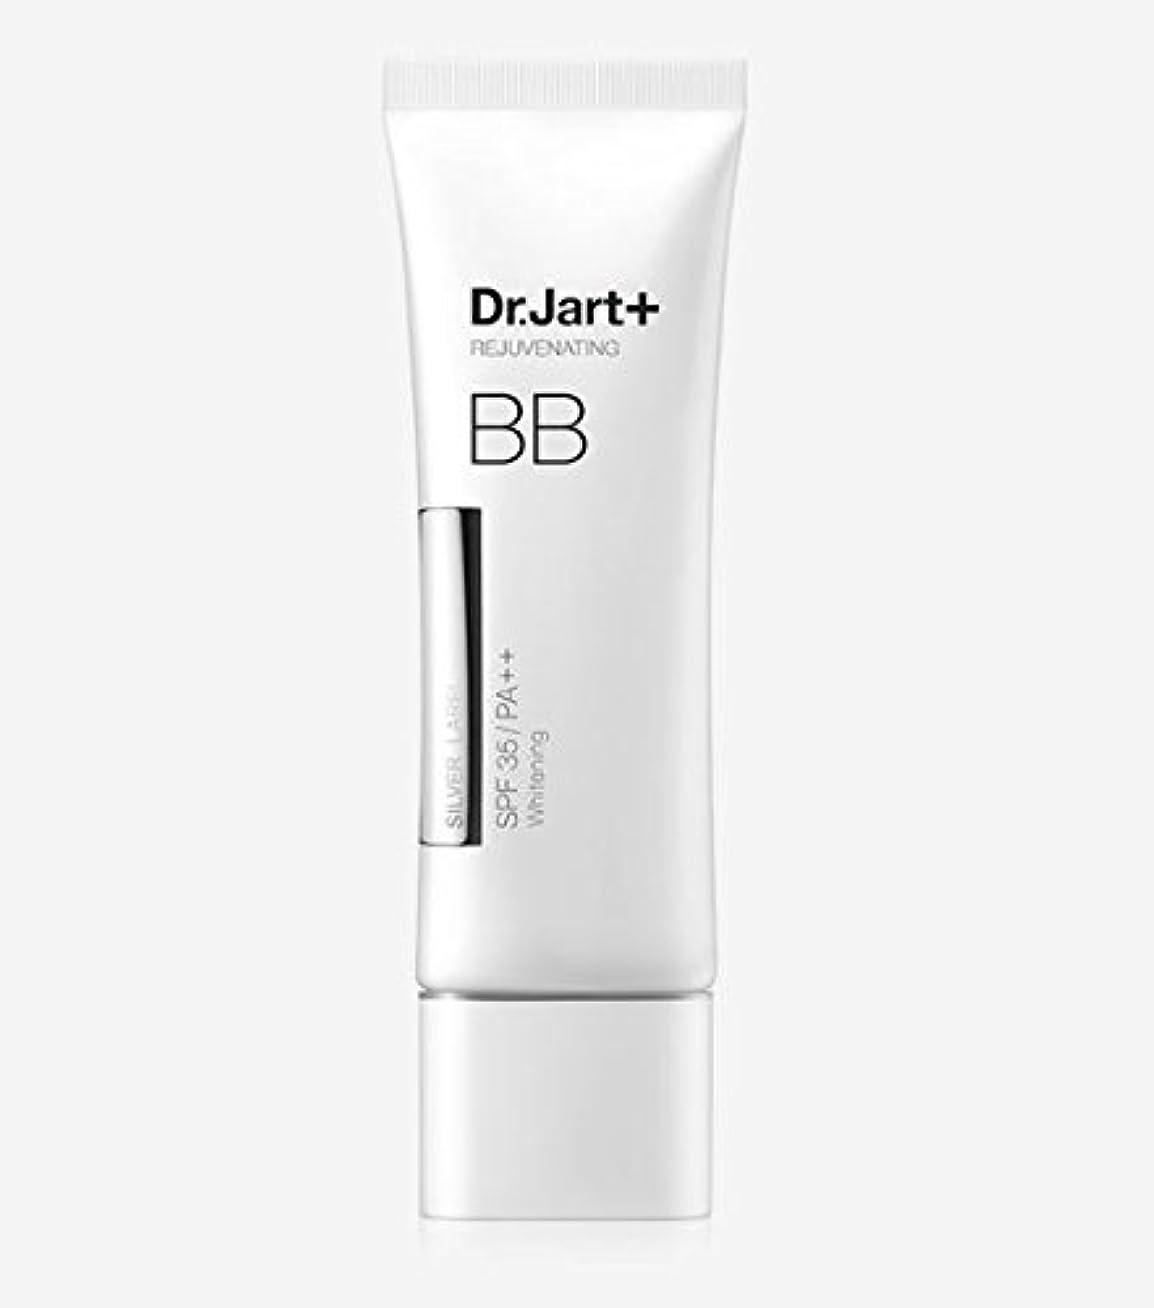 [Dr. Jart] Silver Label BB Rejuvenating Beauty Balm 50ml SPF35 PA++/[ドクタージャルト] シルバーラベル BB リジュビネイティング ビューティー バーム...